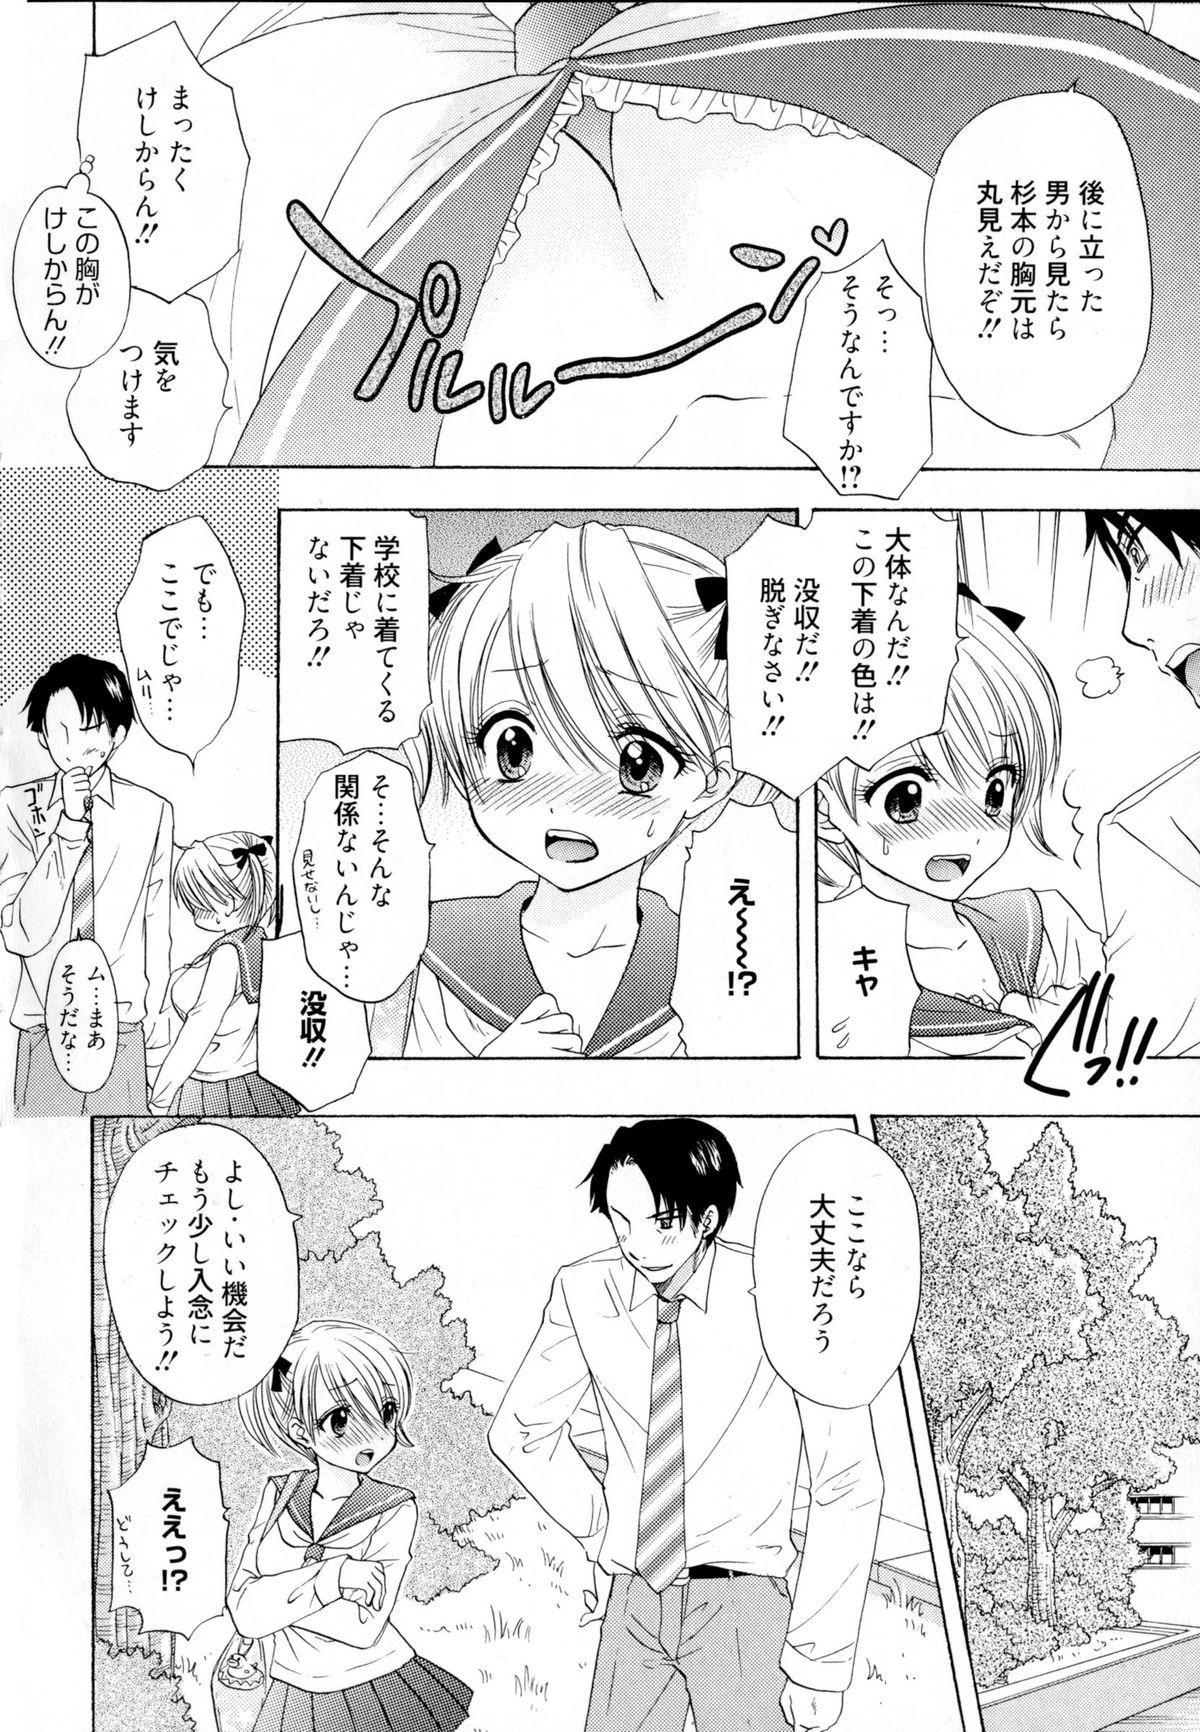 The Great Escape 4 Shokai Genteiban 7